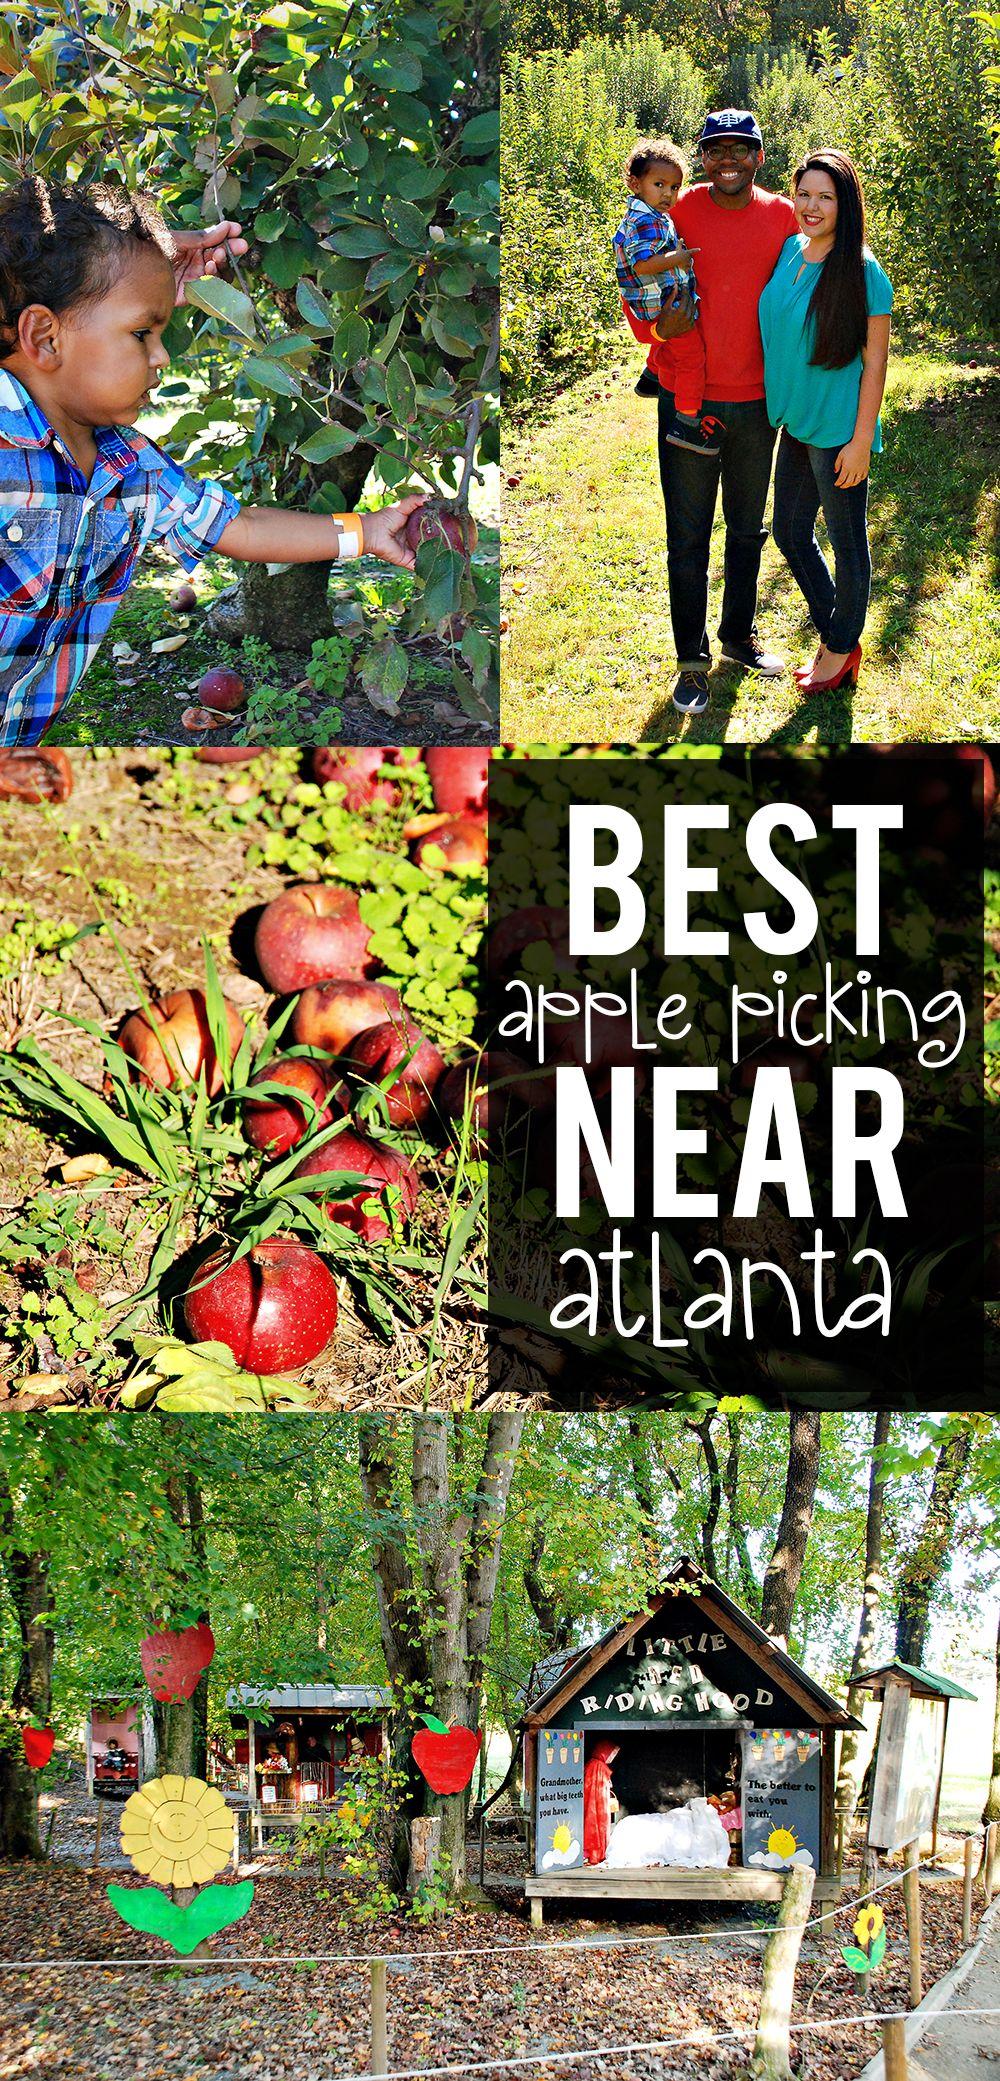 Where to Go Apple Picking with Kids Near Atlanta Atlanta